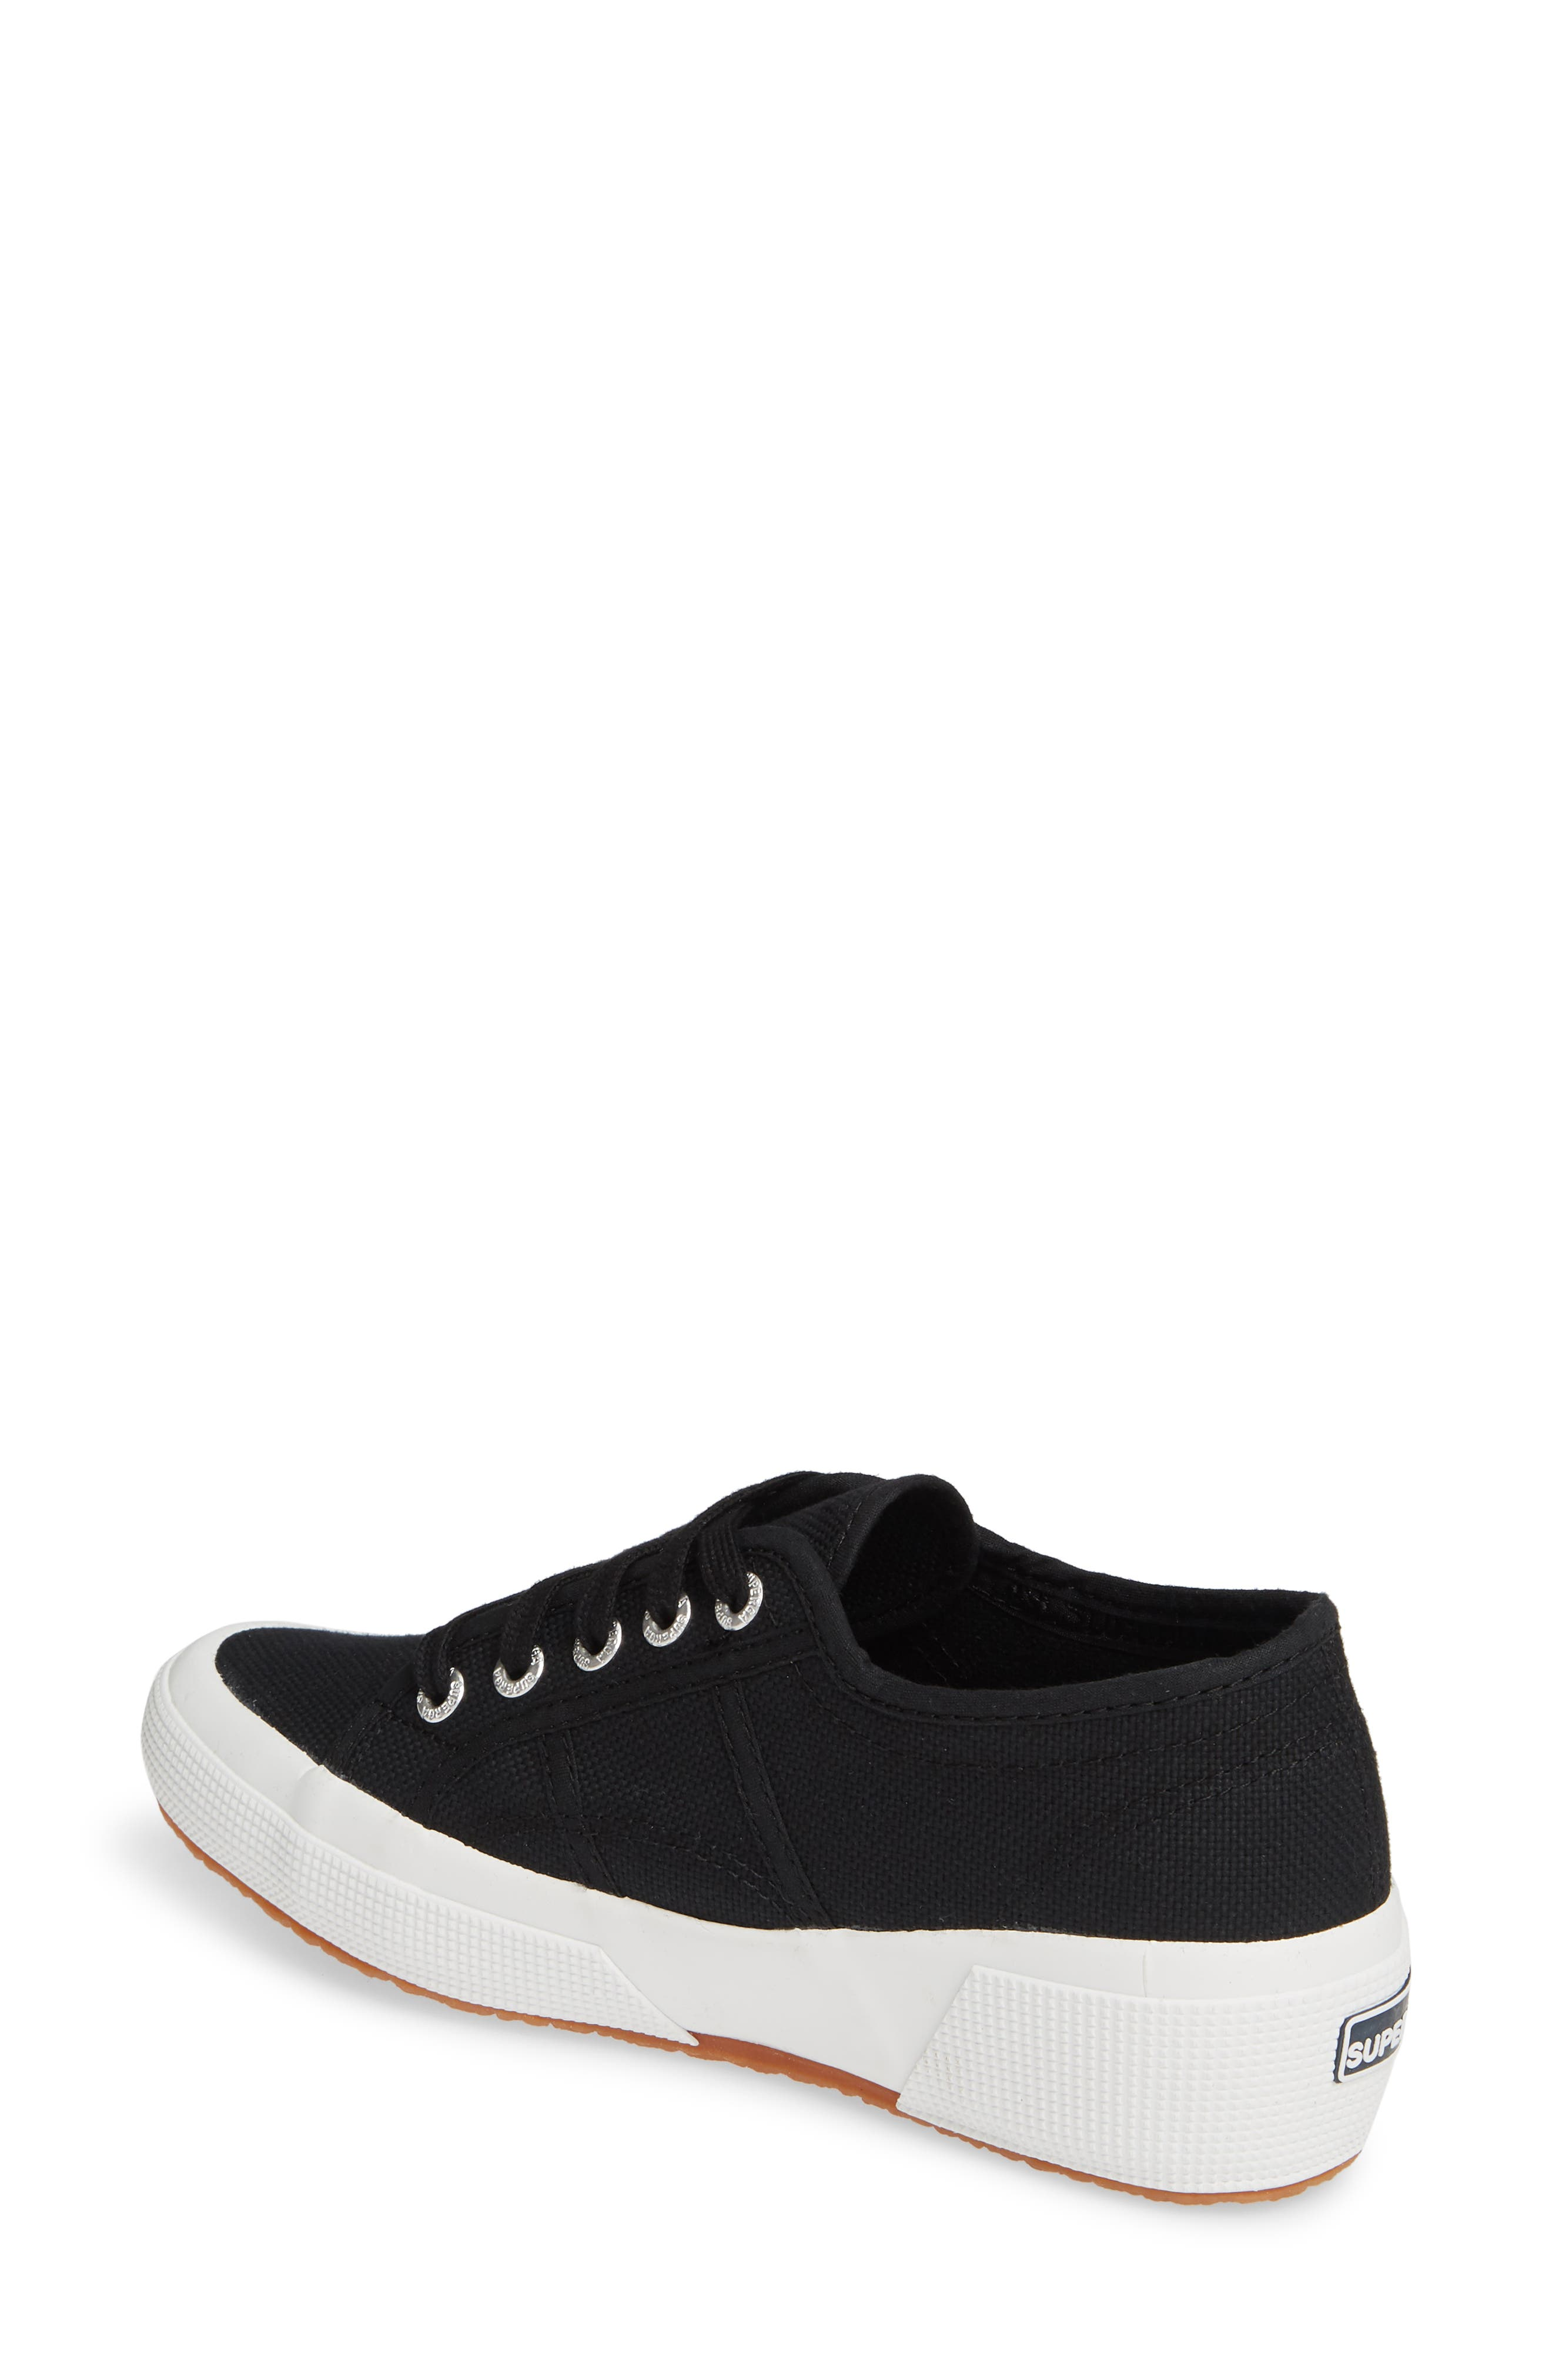 SUPERGA,                             'Linea' Wedge Sneaker,                             Alternate thumbnail 2, color,                             BLACK / WHITE